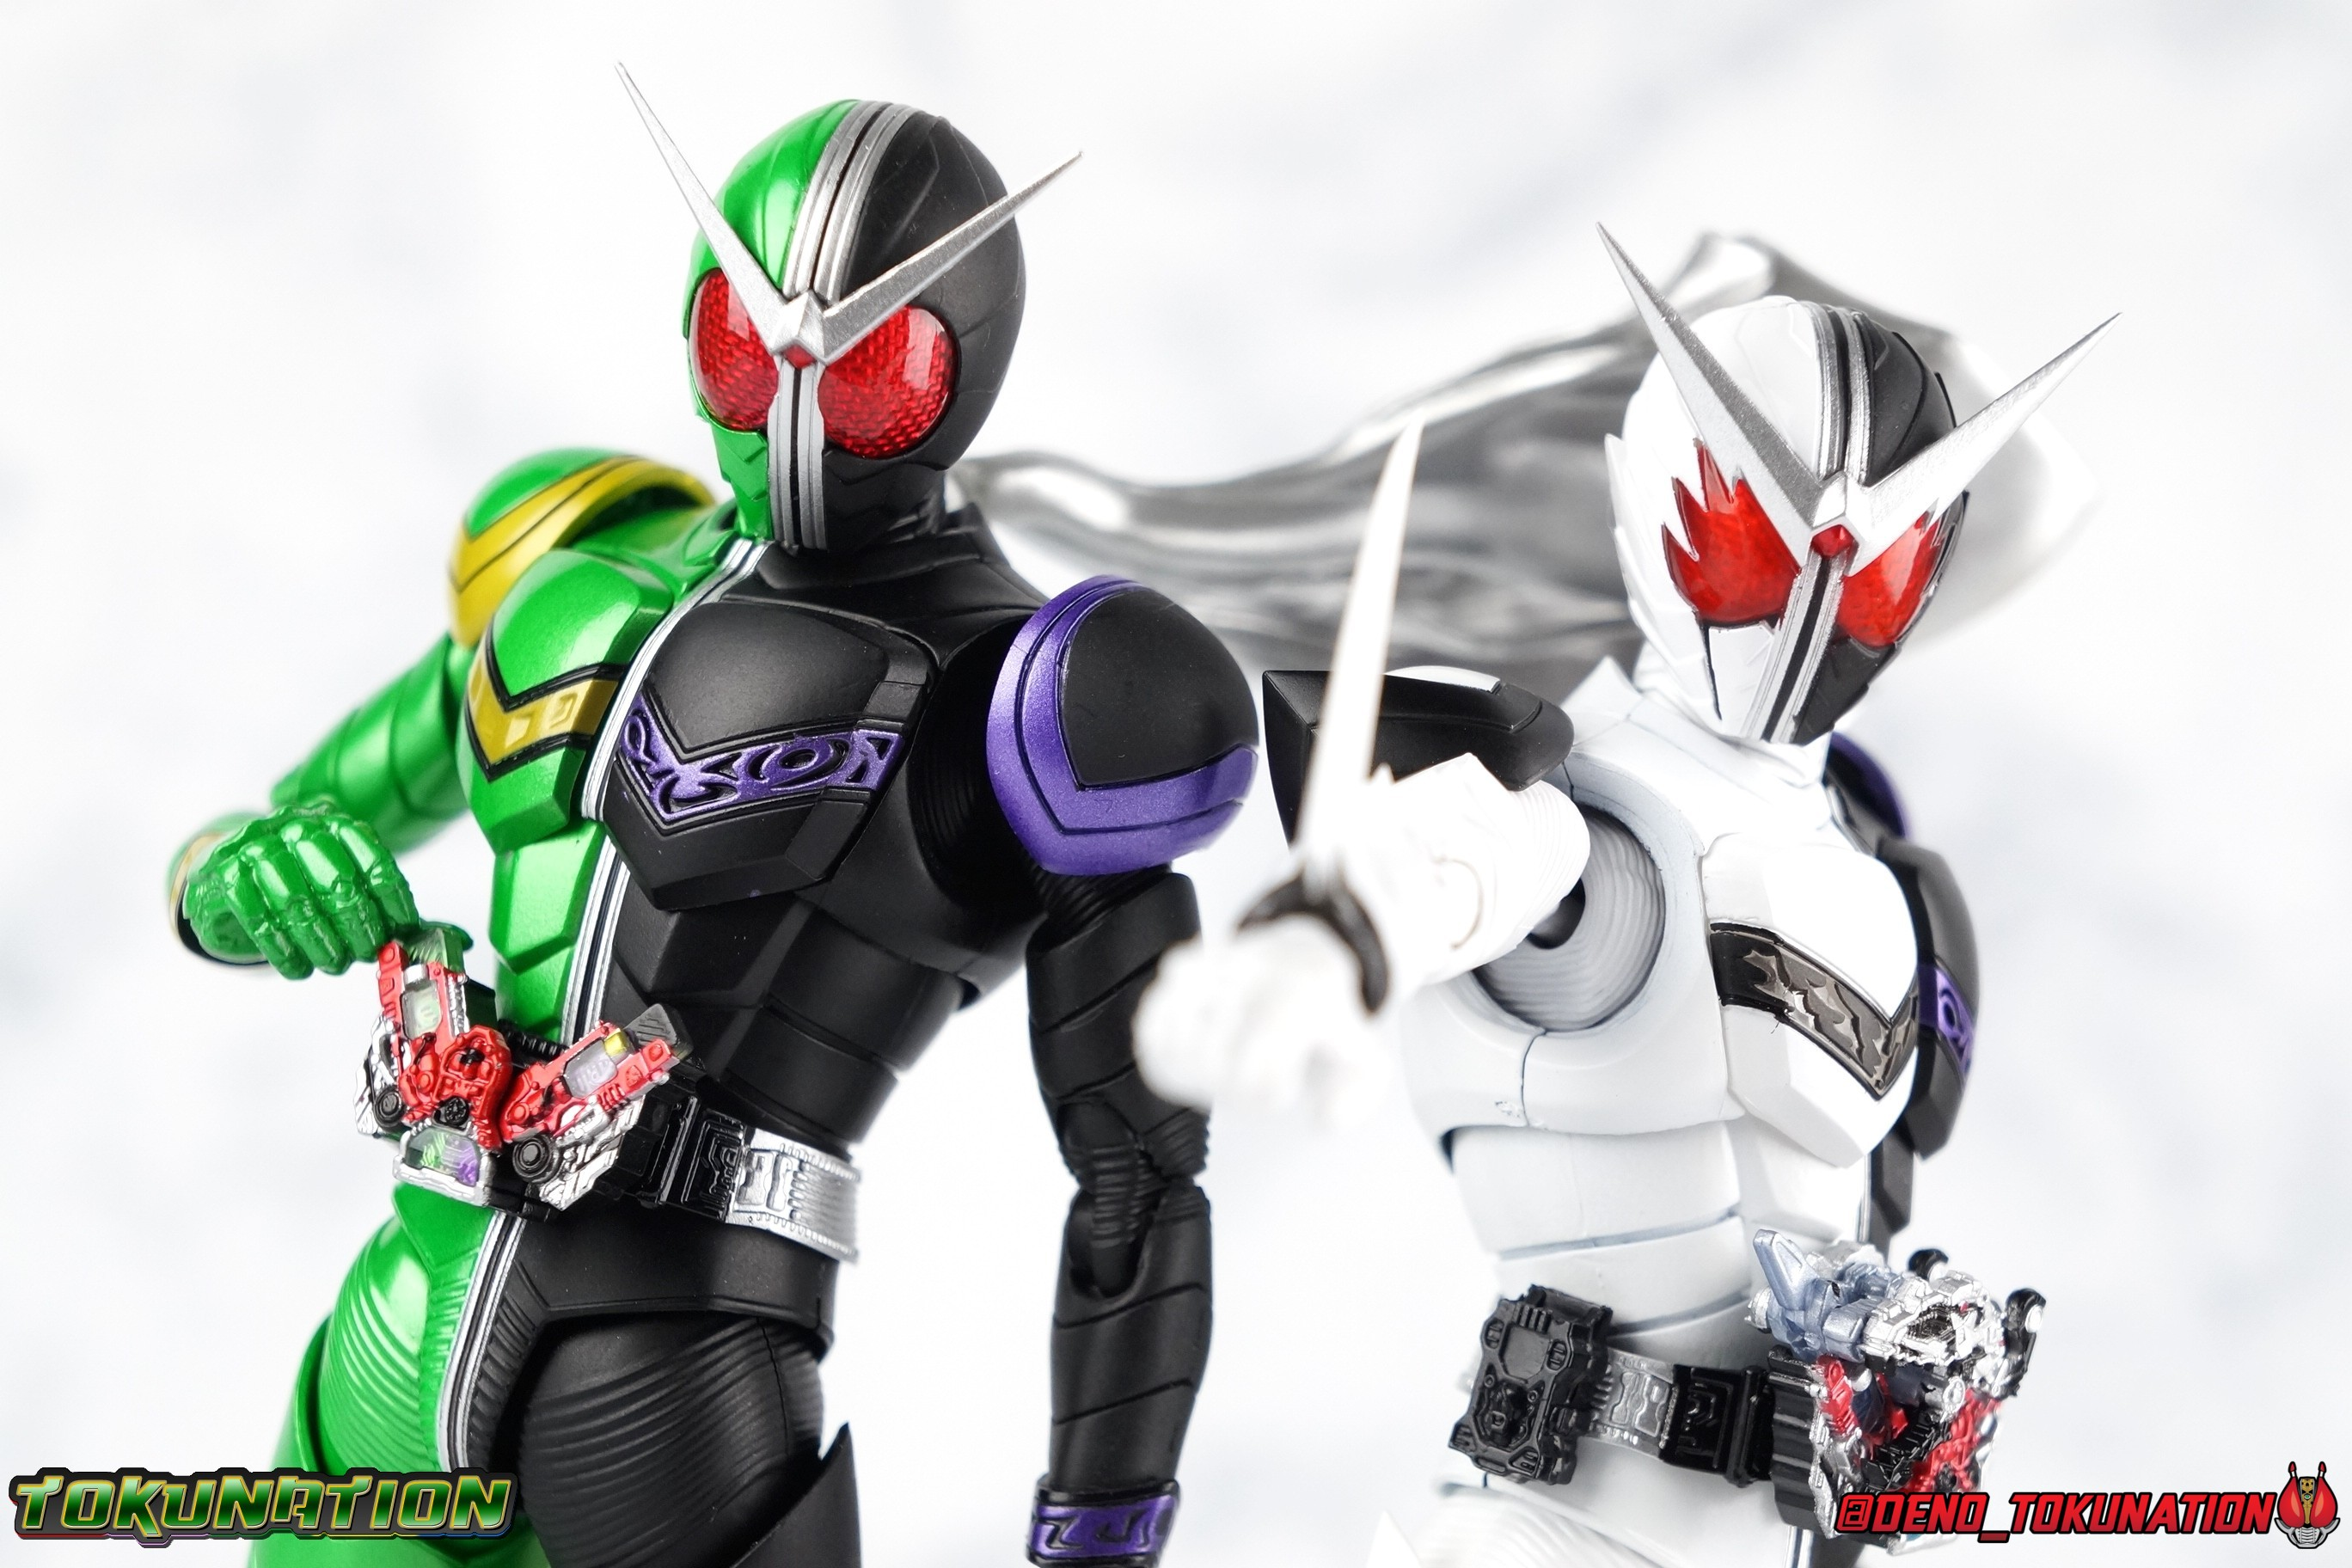 S.H. Figuarts Shinkocchou Seihou Kamen Rider W Fang Joker Gallery